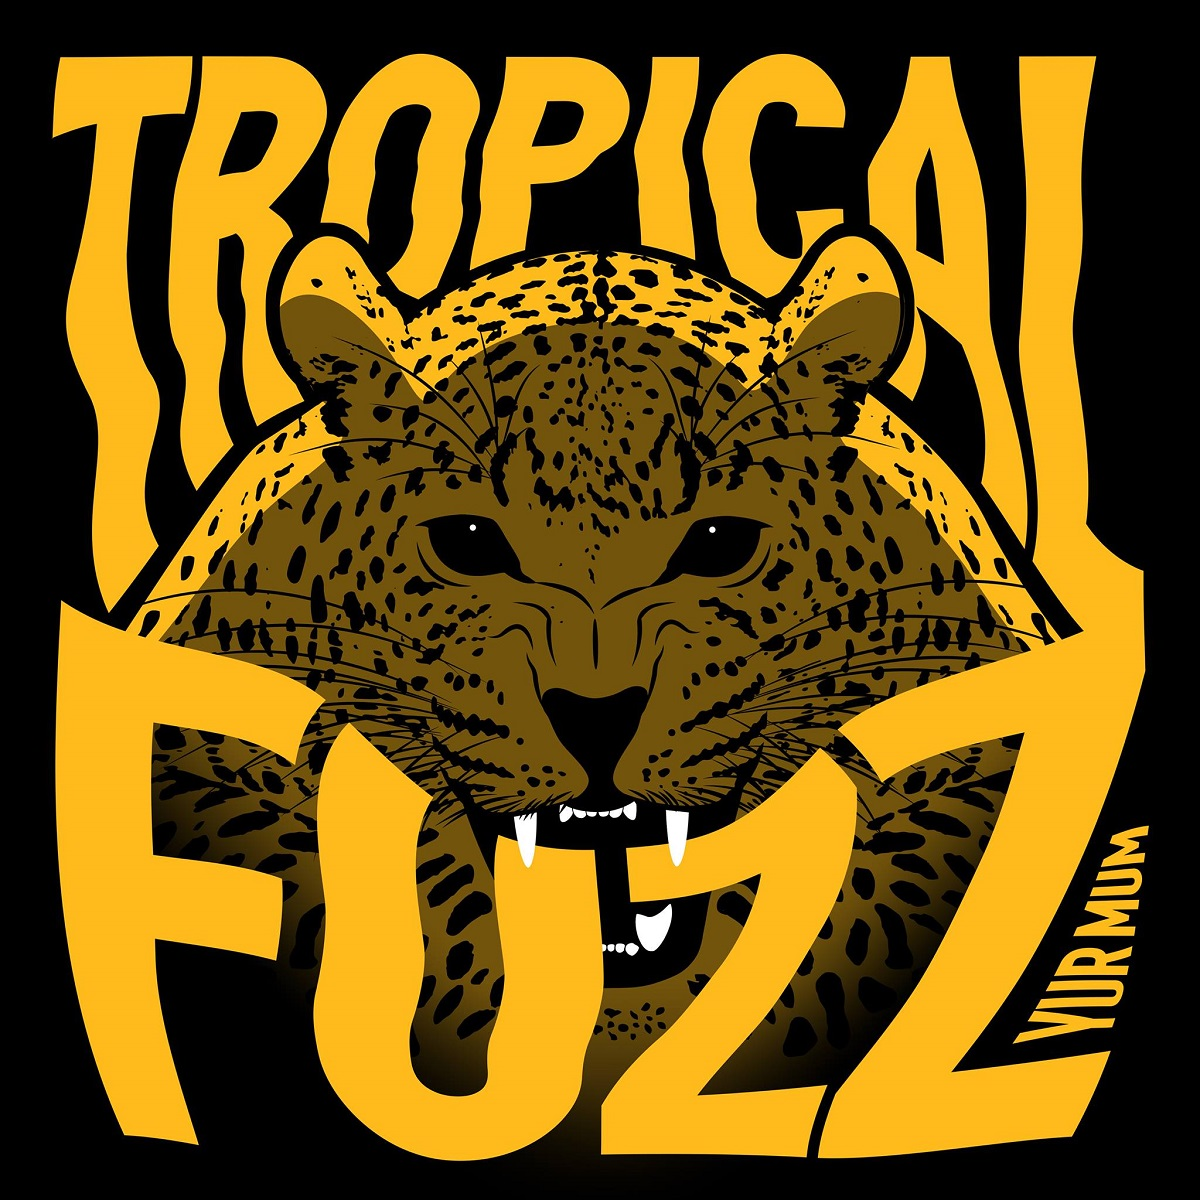 Review: Yur Mum – Tropical Fuzz